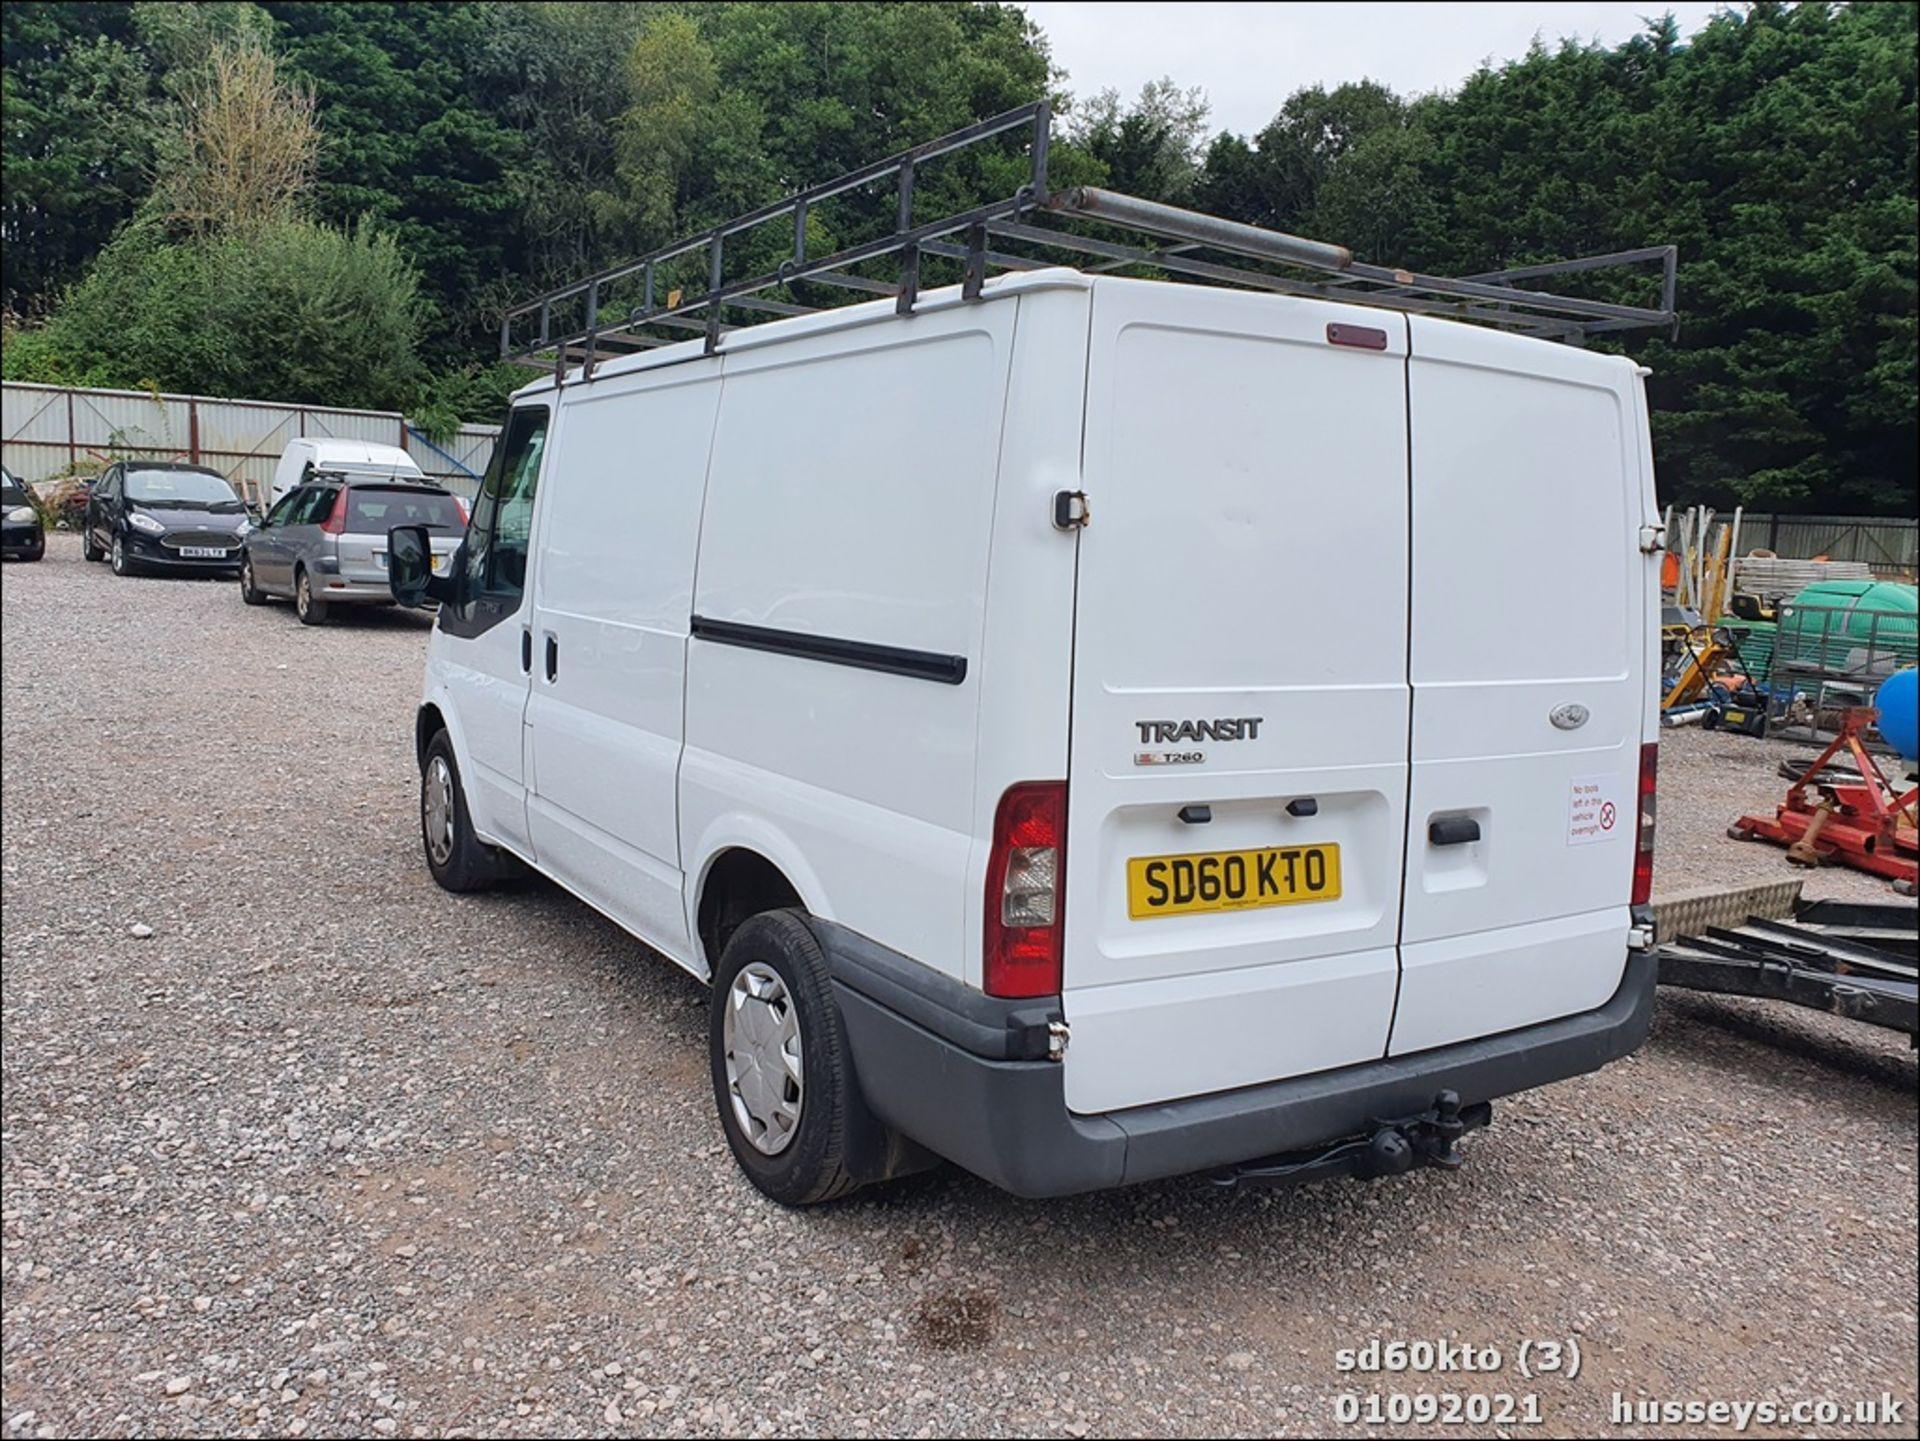 10/60 FORD TRANSIT 85 T260M FWD - 2198cc 5dr Van (White, 237k) - Image 8 of 23